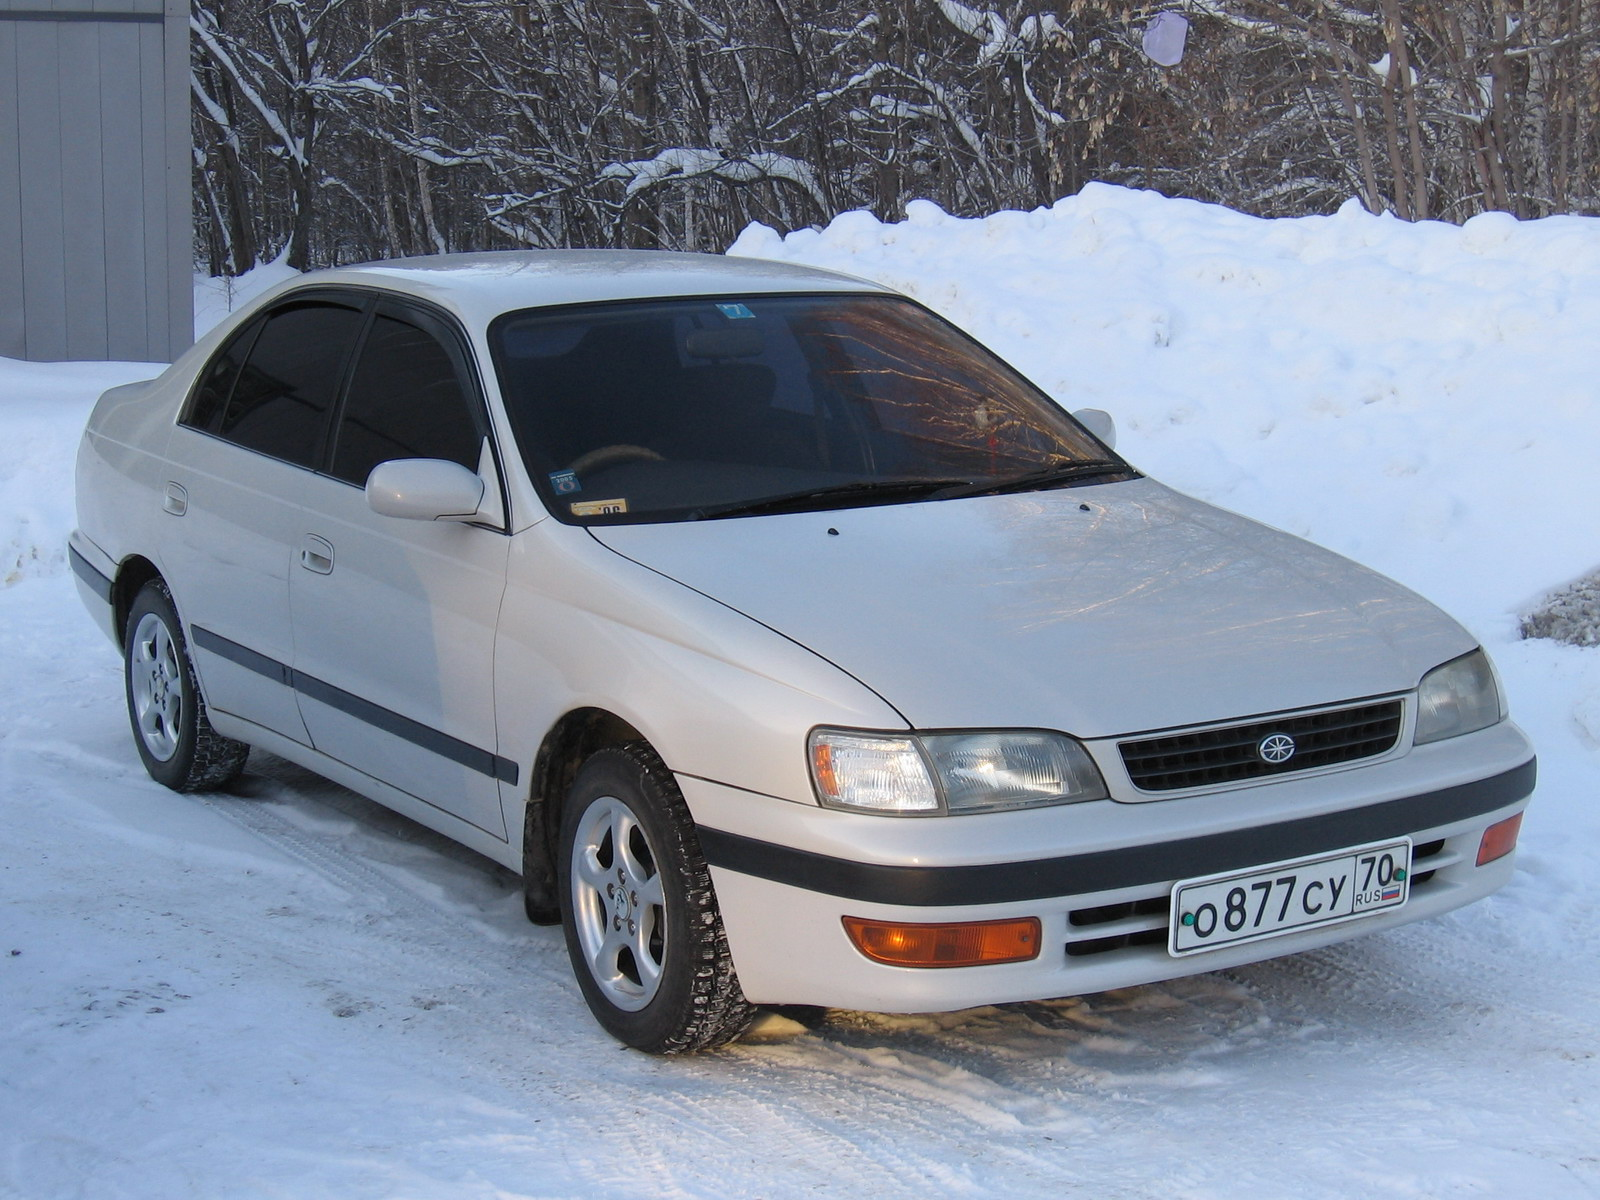 Toyota Corona Premio, Красноярск : Объявления : 24AUTO.RU